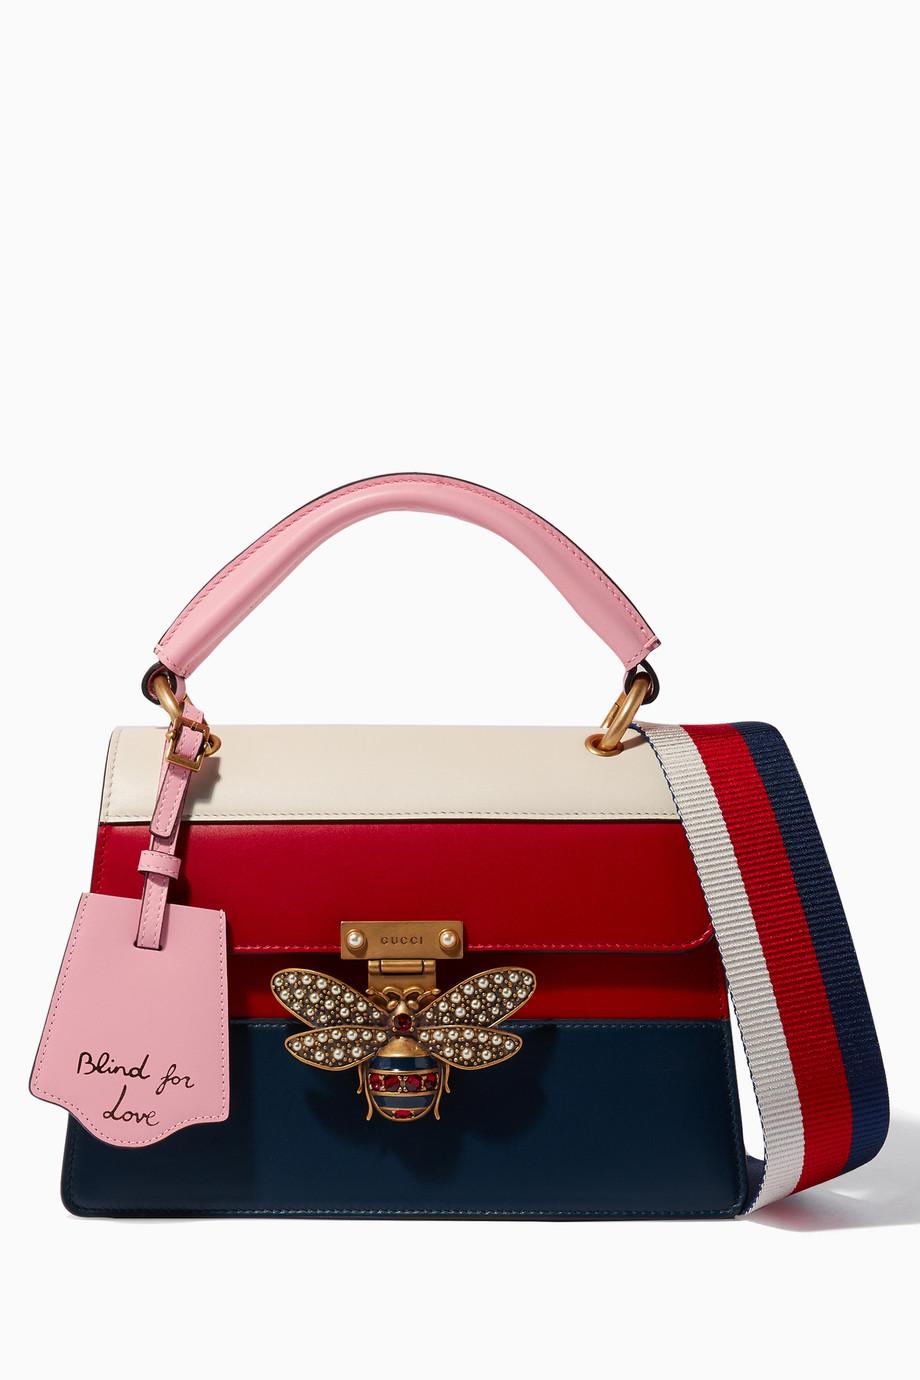 9c2a9beccd68a Shop Gucci Blue Dark-Blue Small Queen Margaret Top Handle Bag for Women |  Ounass UAE